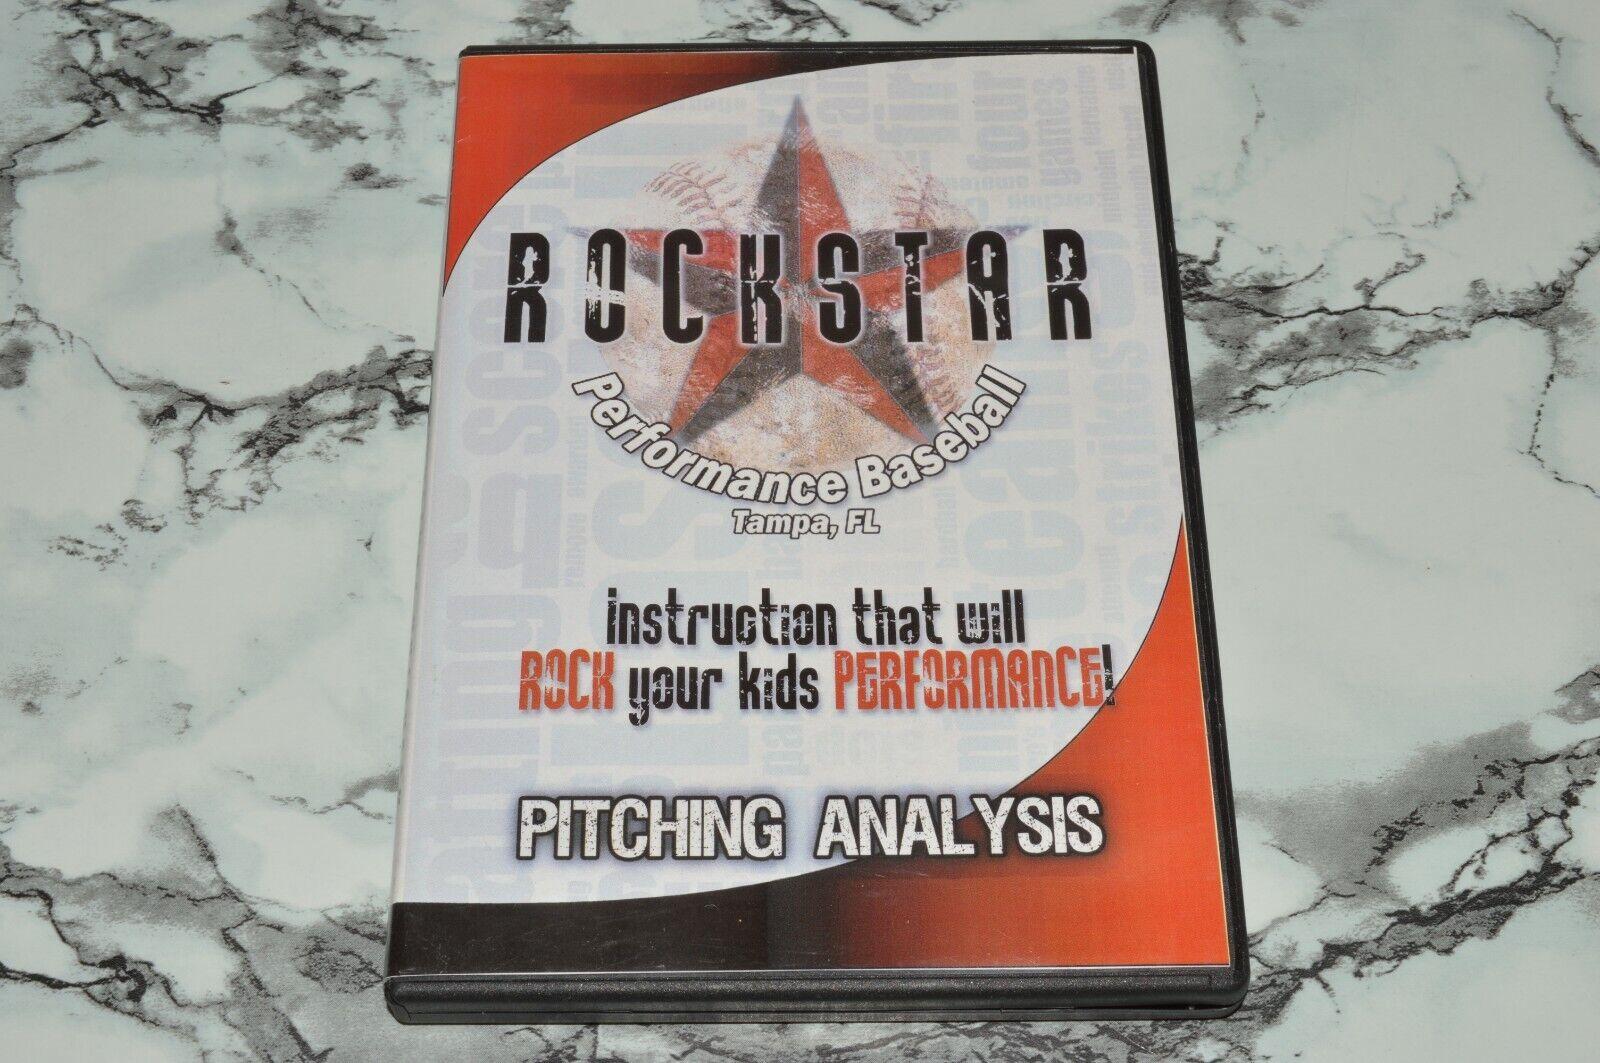 Rockstar Performance Baseball - Pitching Analysis DVD  - $12.68